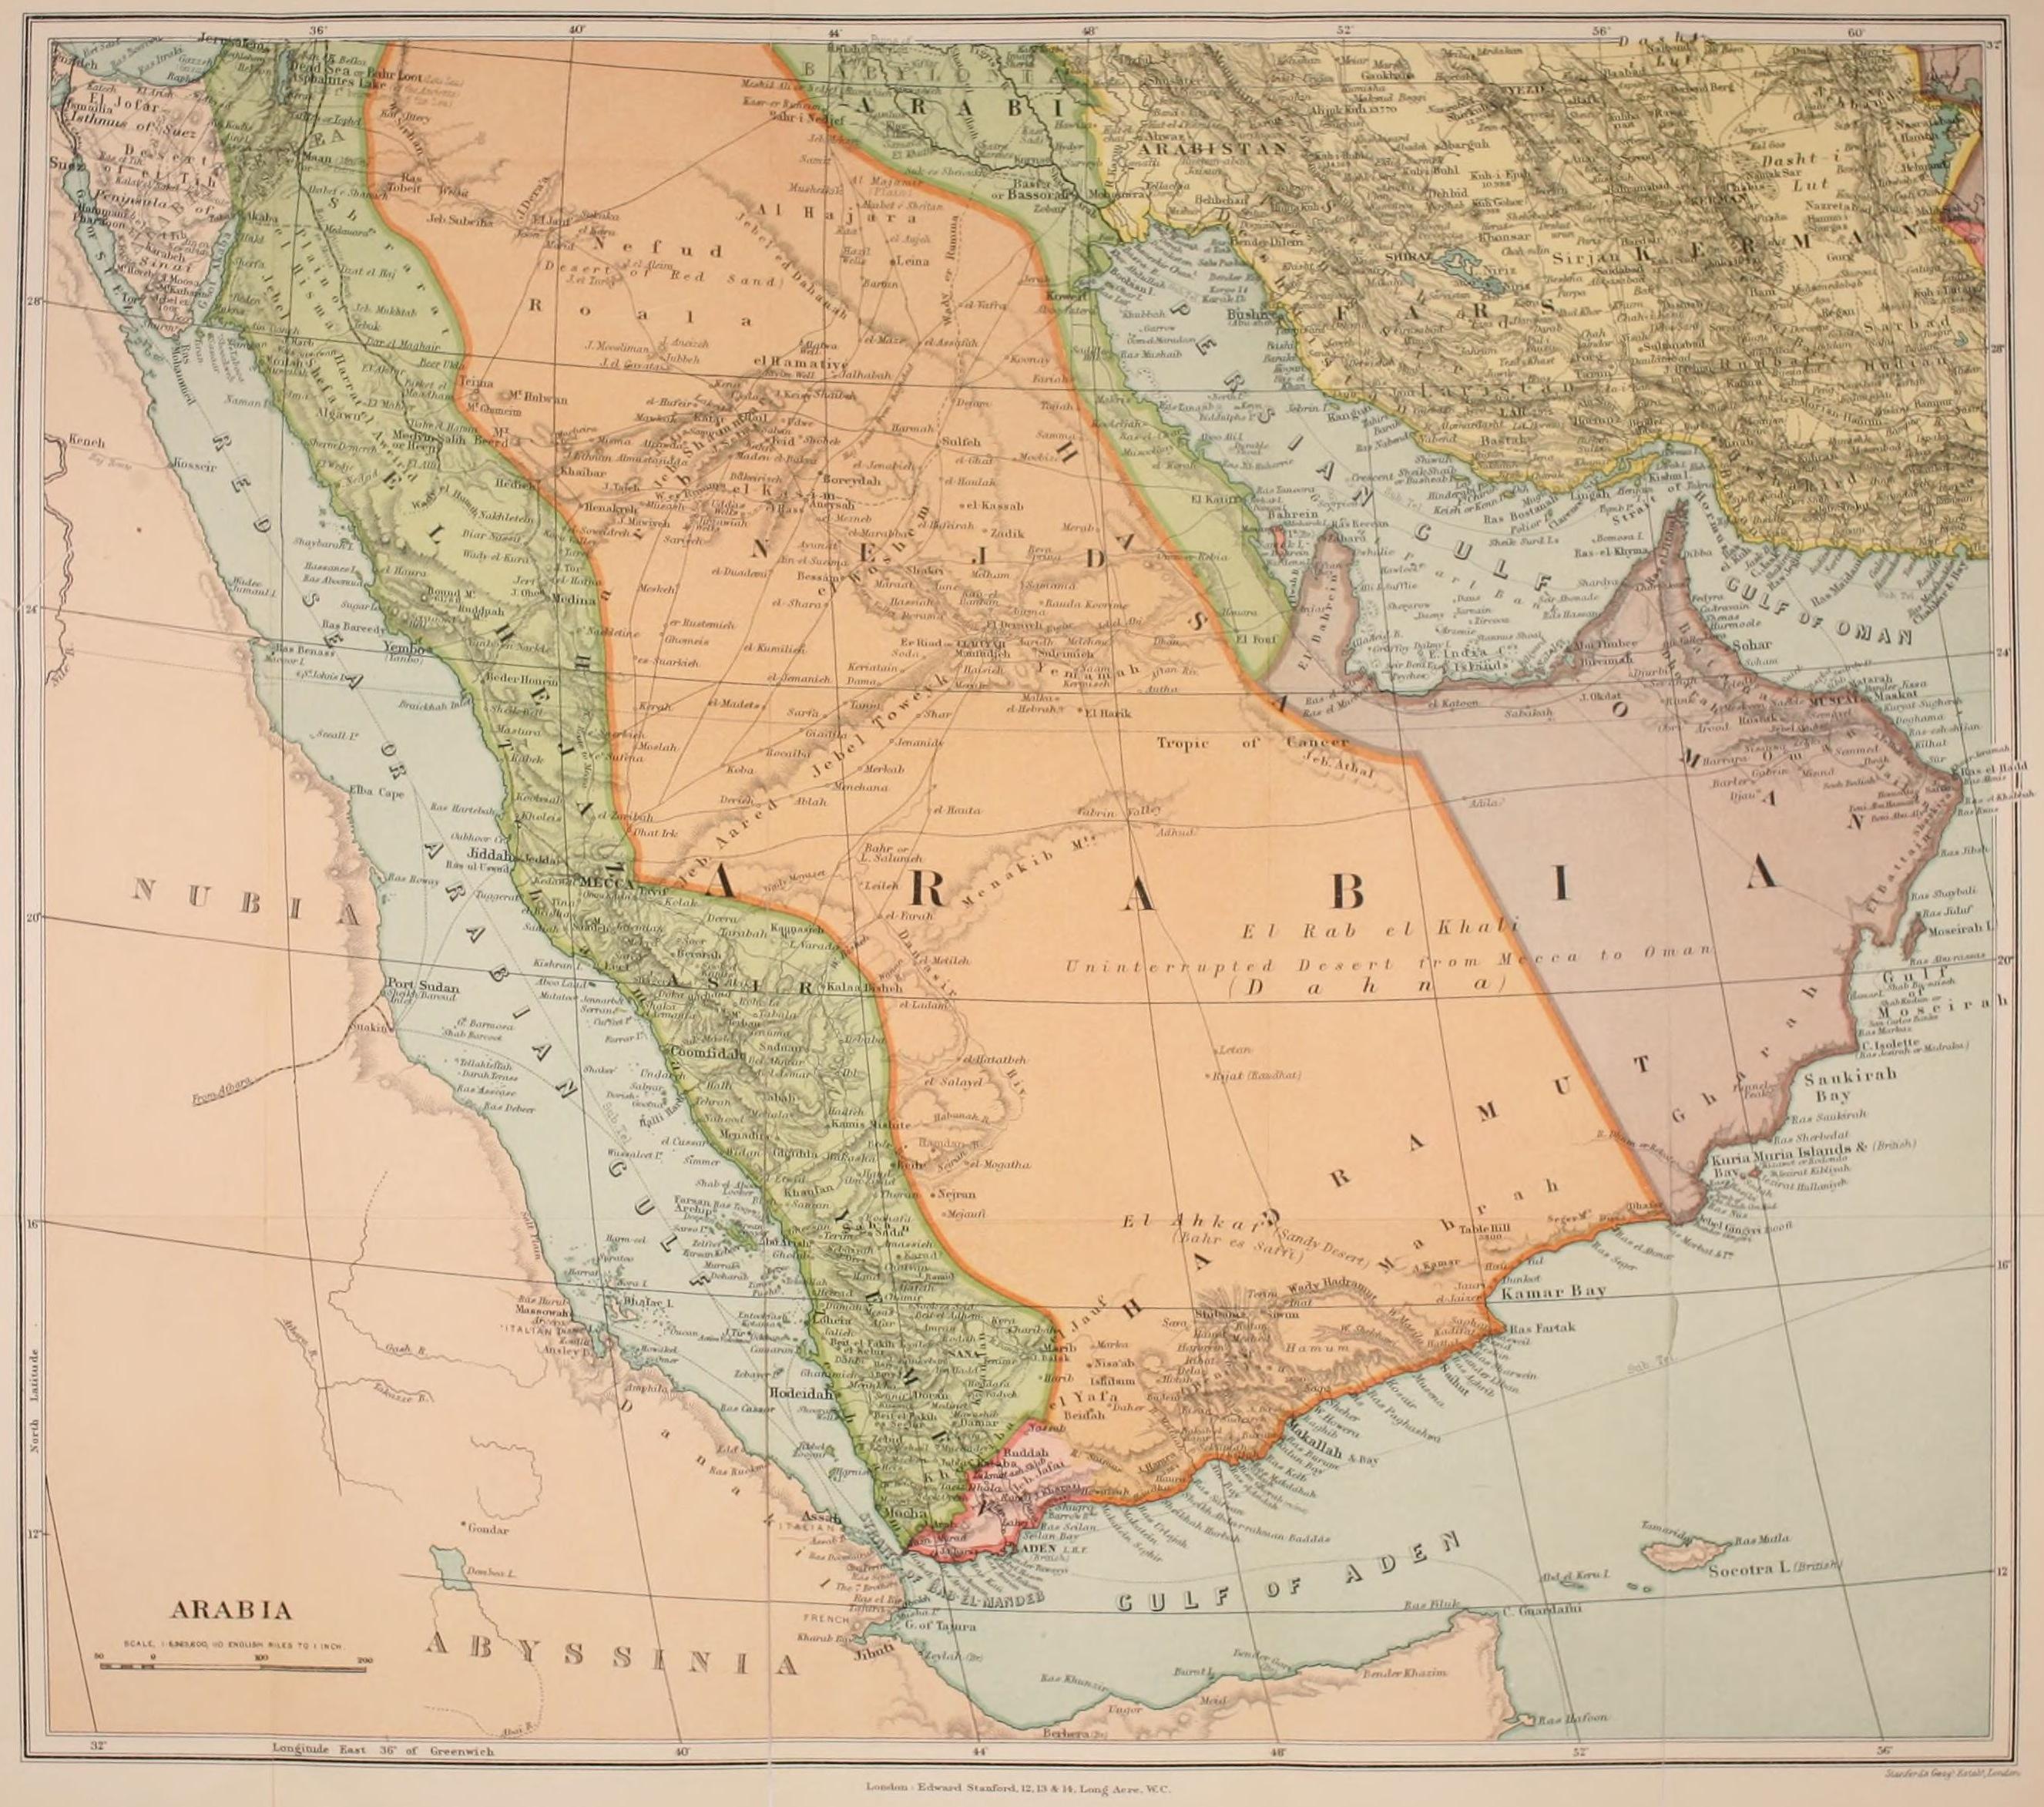 FileMap of Arabia early 20th centuryjpg Wikimedia Commons – Map of Arabia